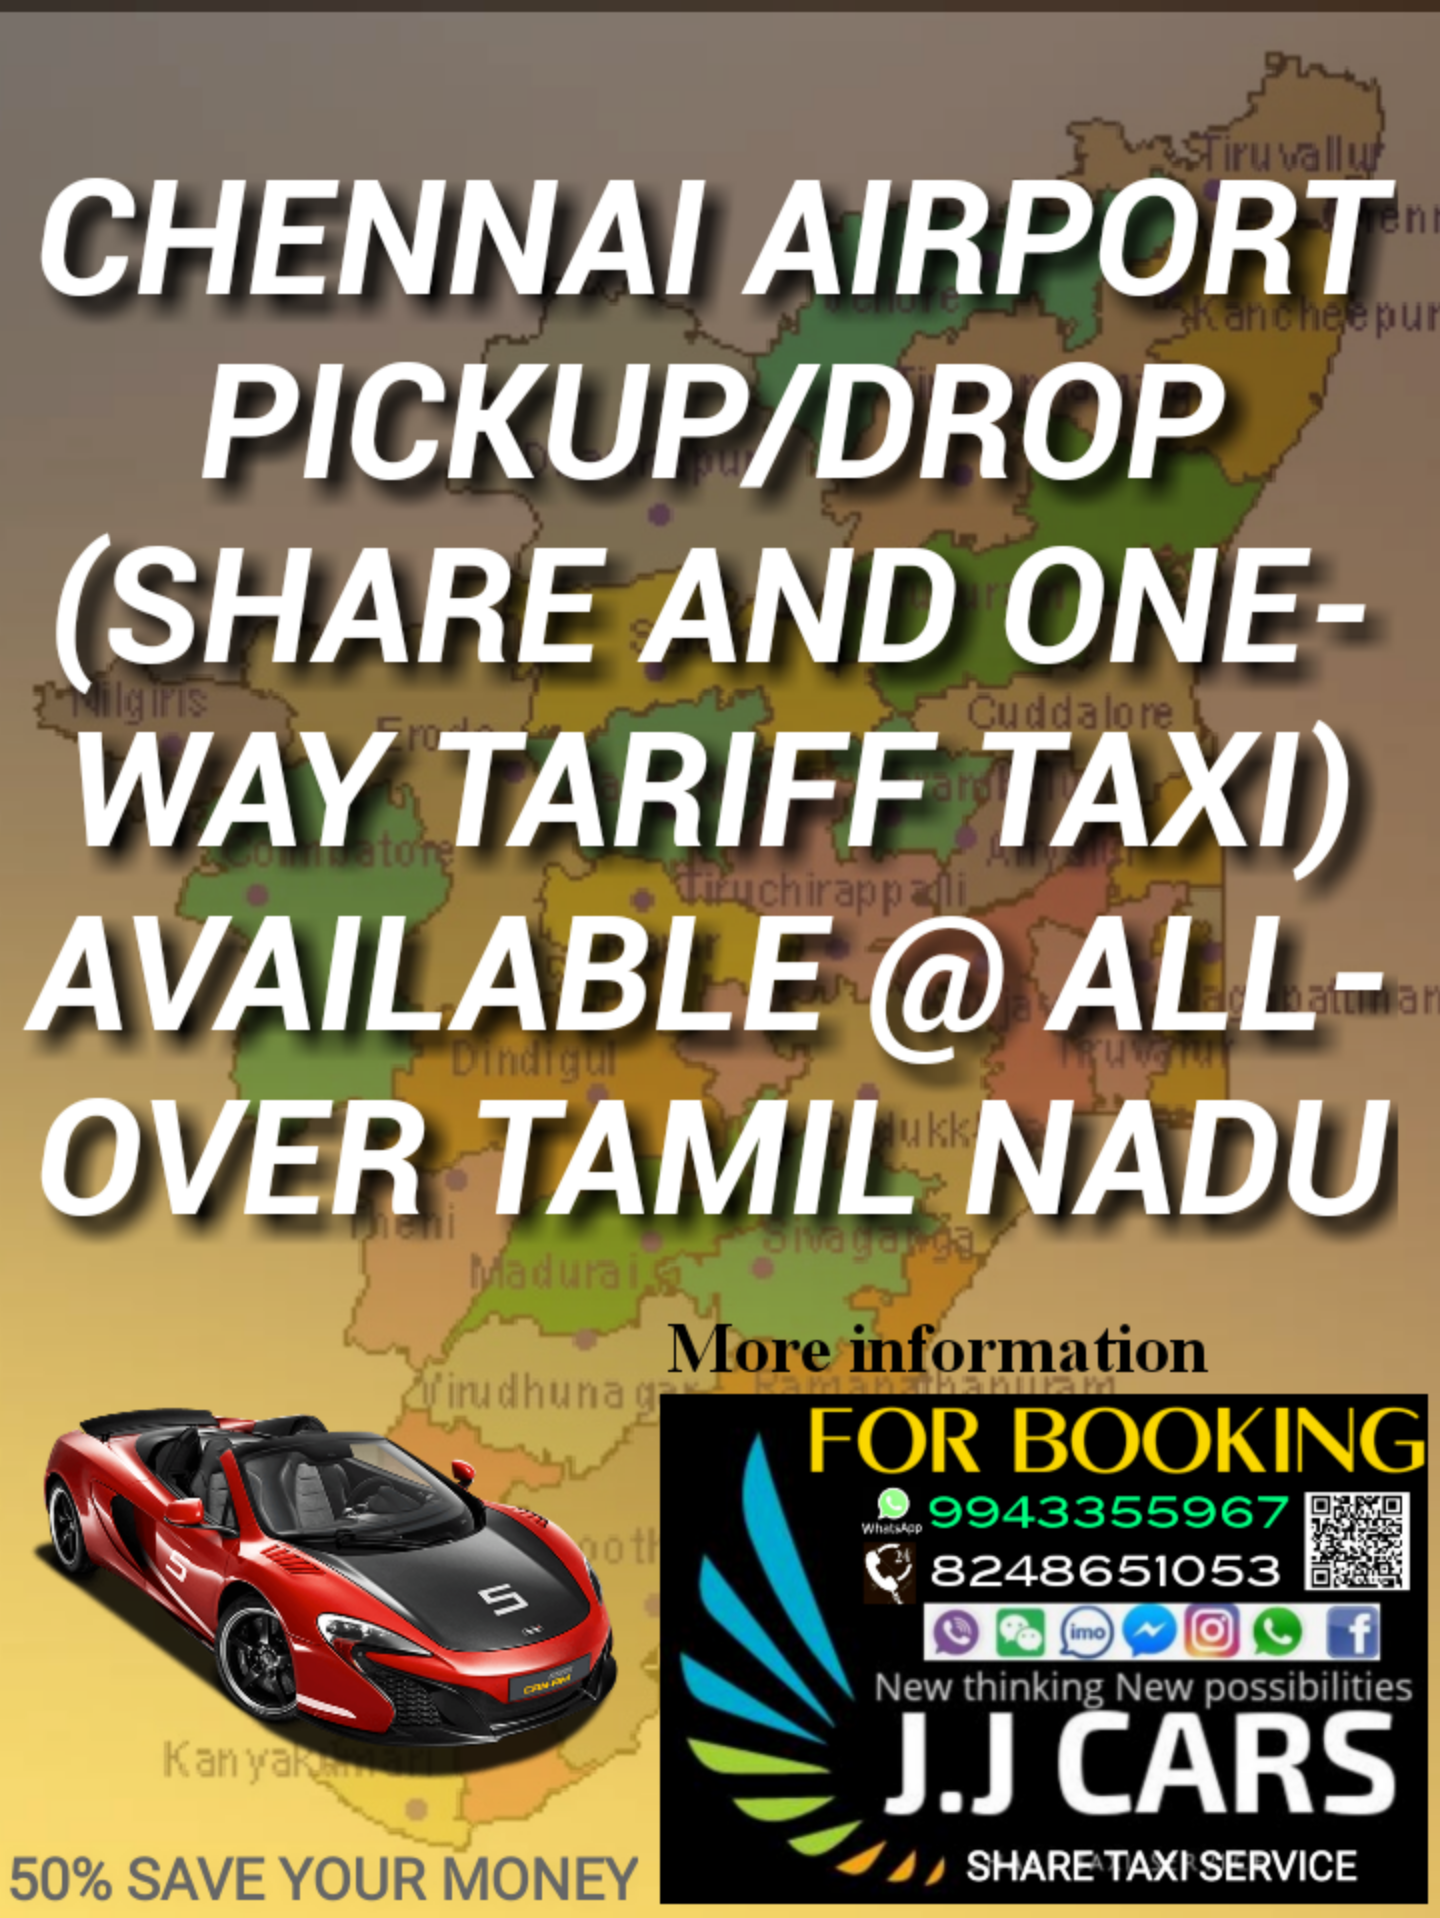 J J Cars Share Taxi Service Travel Agency